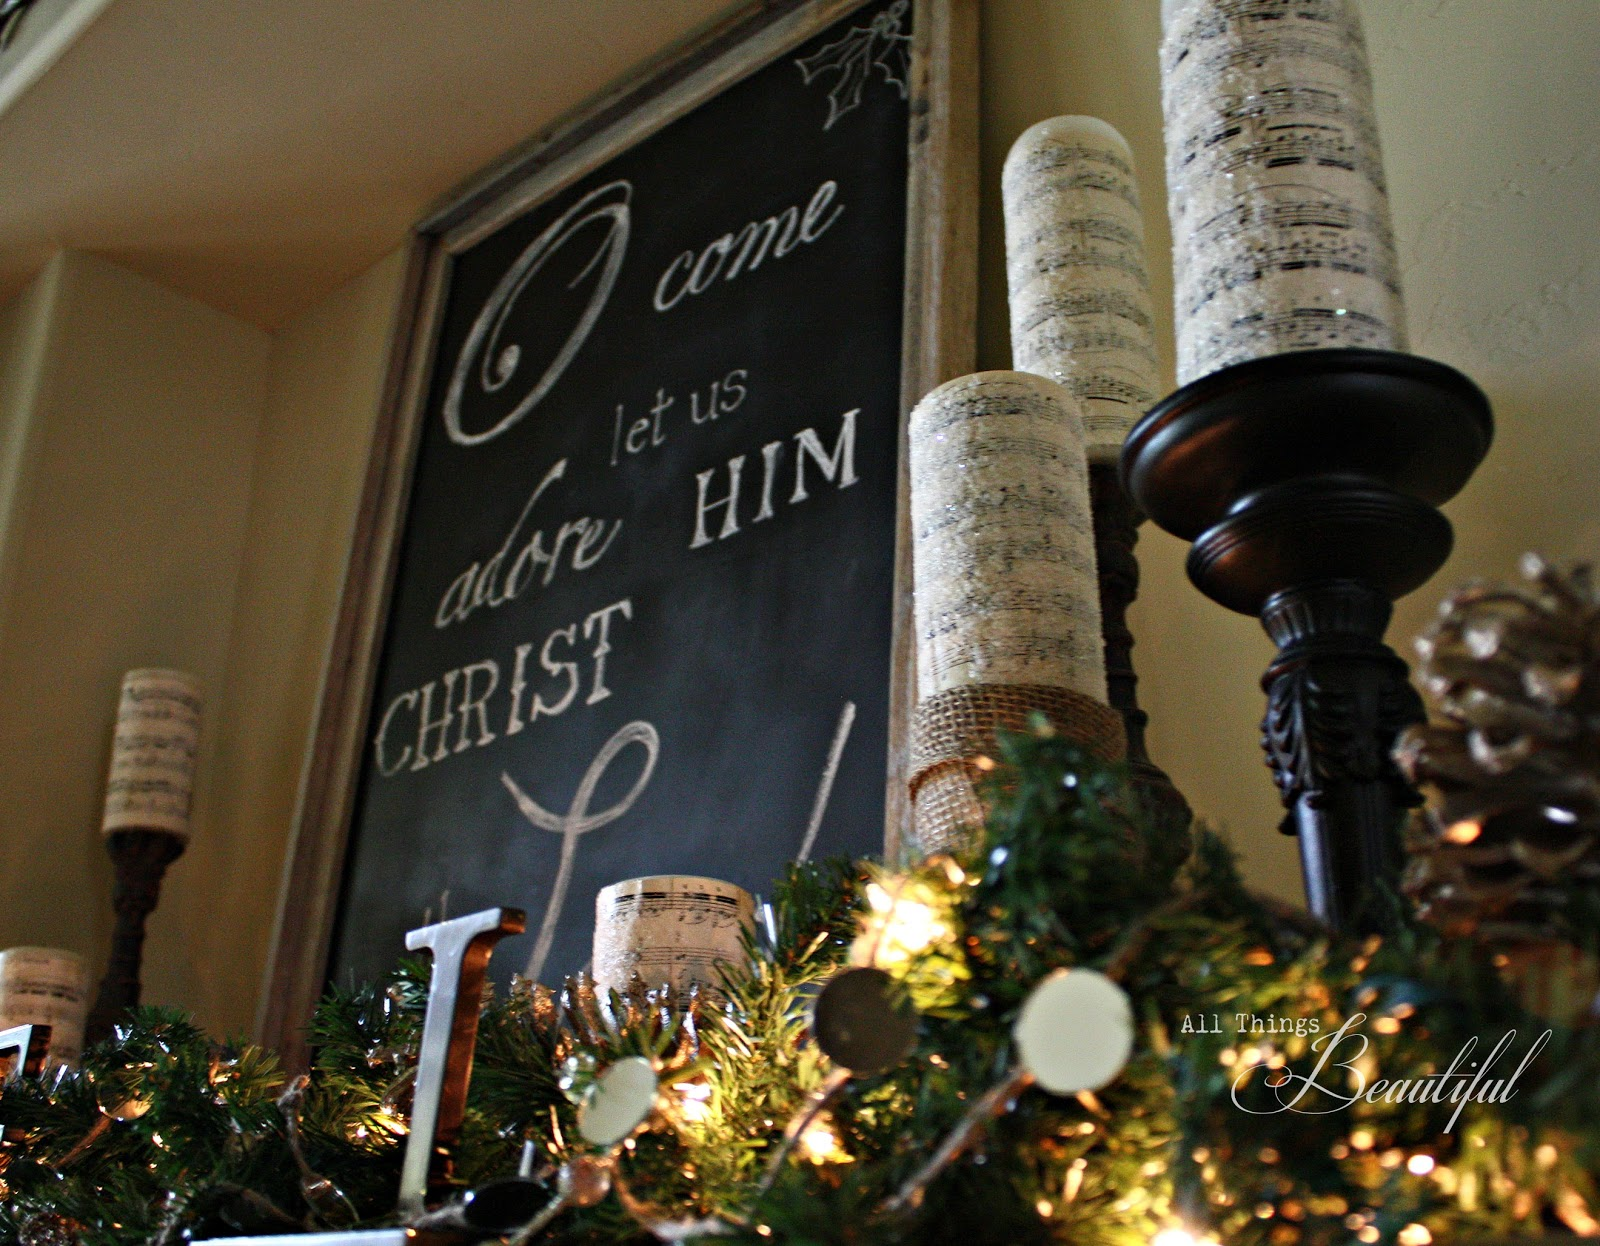 http://2.bp.blogspot.com/-nHRUCsyvVdI/ULvdRTXDeXI/AAAAAAAABco/soauWUYYv-c/s1600/Christmas+mantle+1.jpg